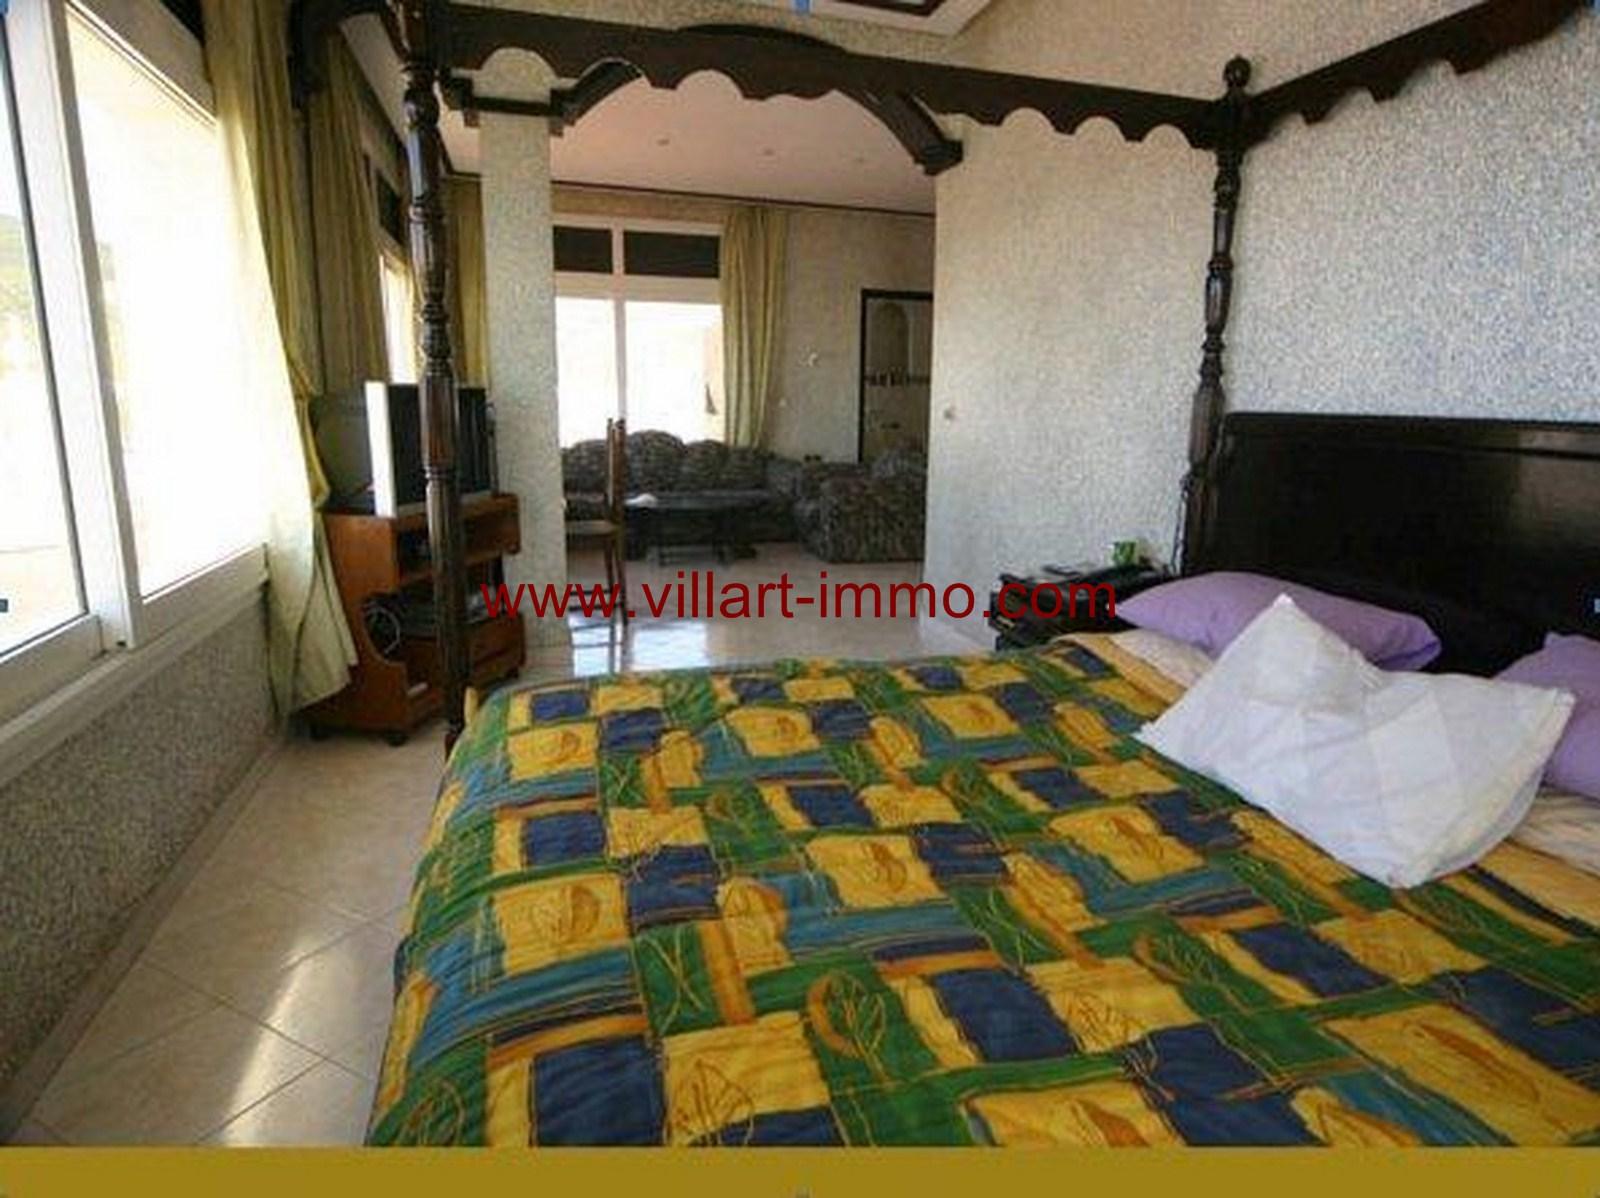 8-Location-Villa-Meublée-Tanger-Achakar-Chambre 1-LV910-Villart immo